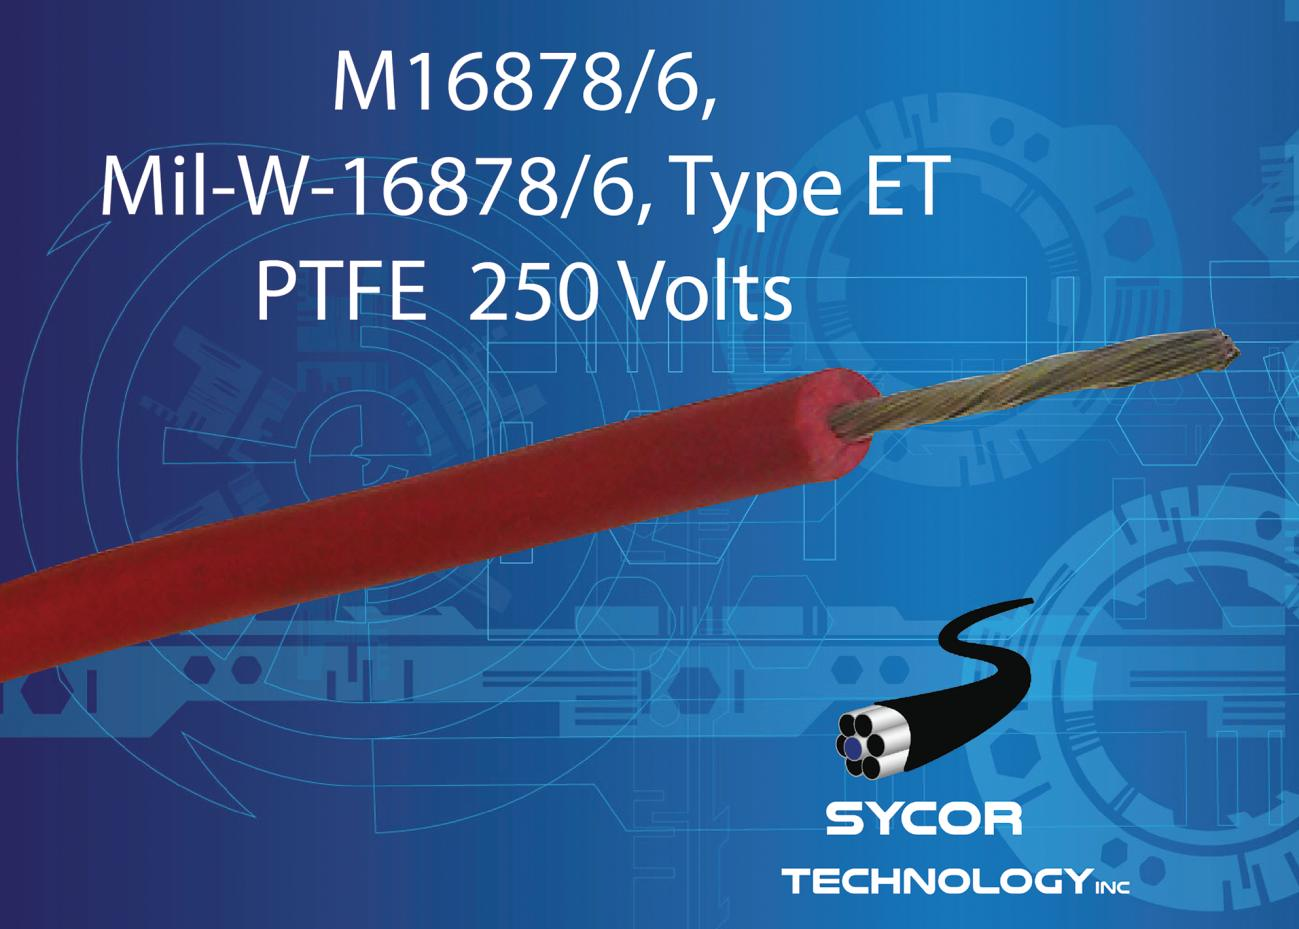 M16878/6, Mil-W-16878/6, Type ET Wire